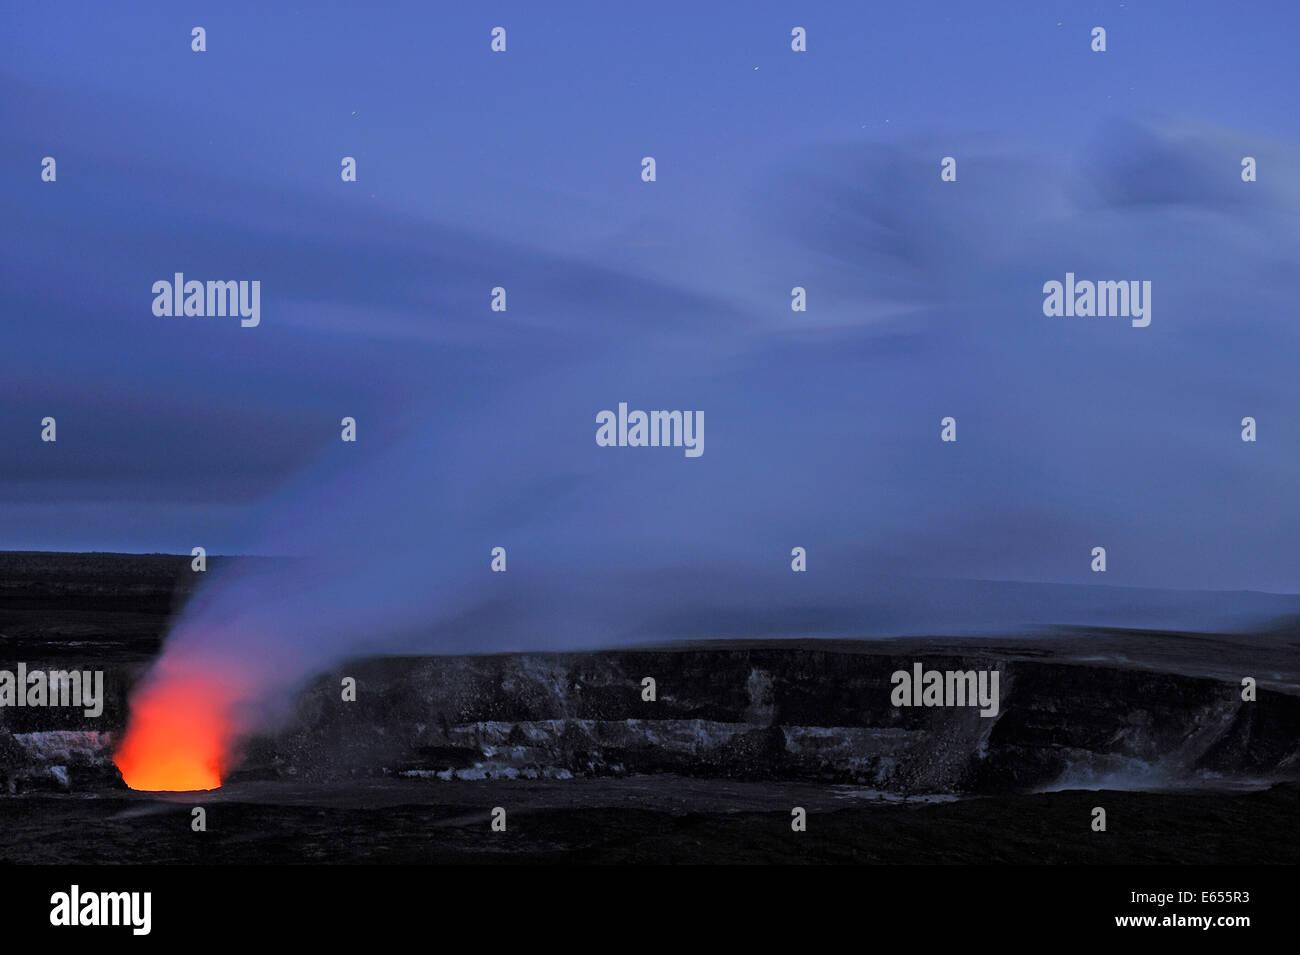 Halemaumau crater erupting, by night, Kilauea Volcano, Big Island, Hawaii Islands, USA - Stock Image